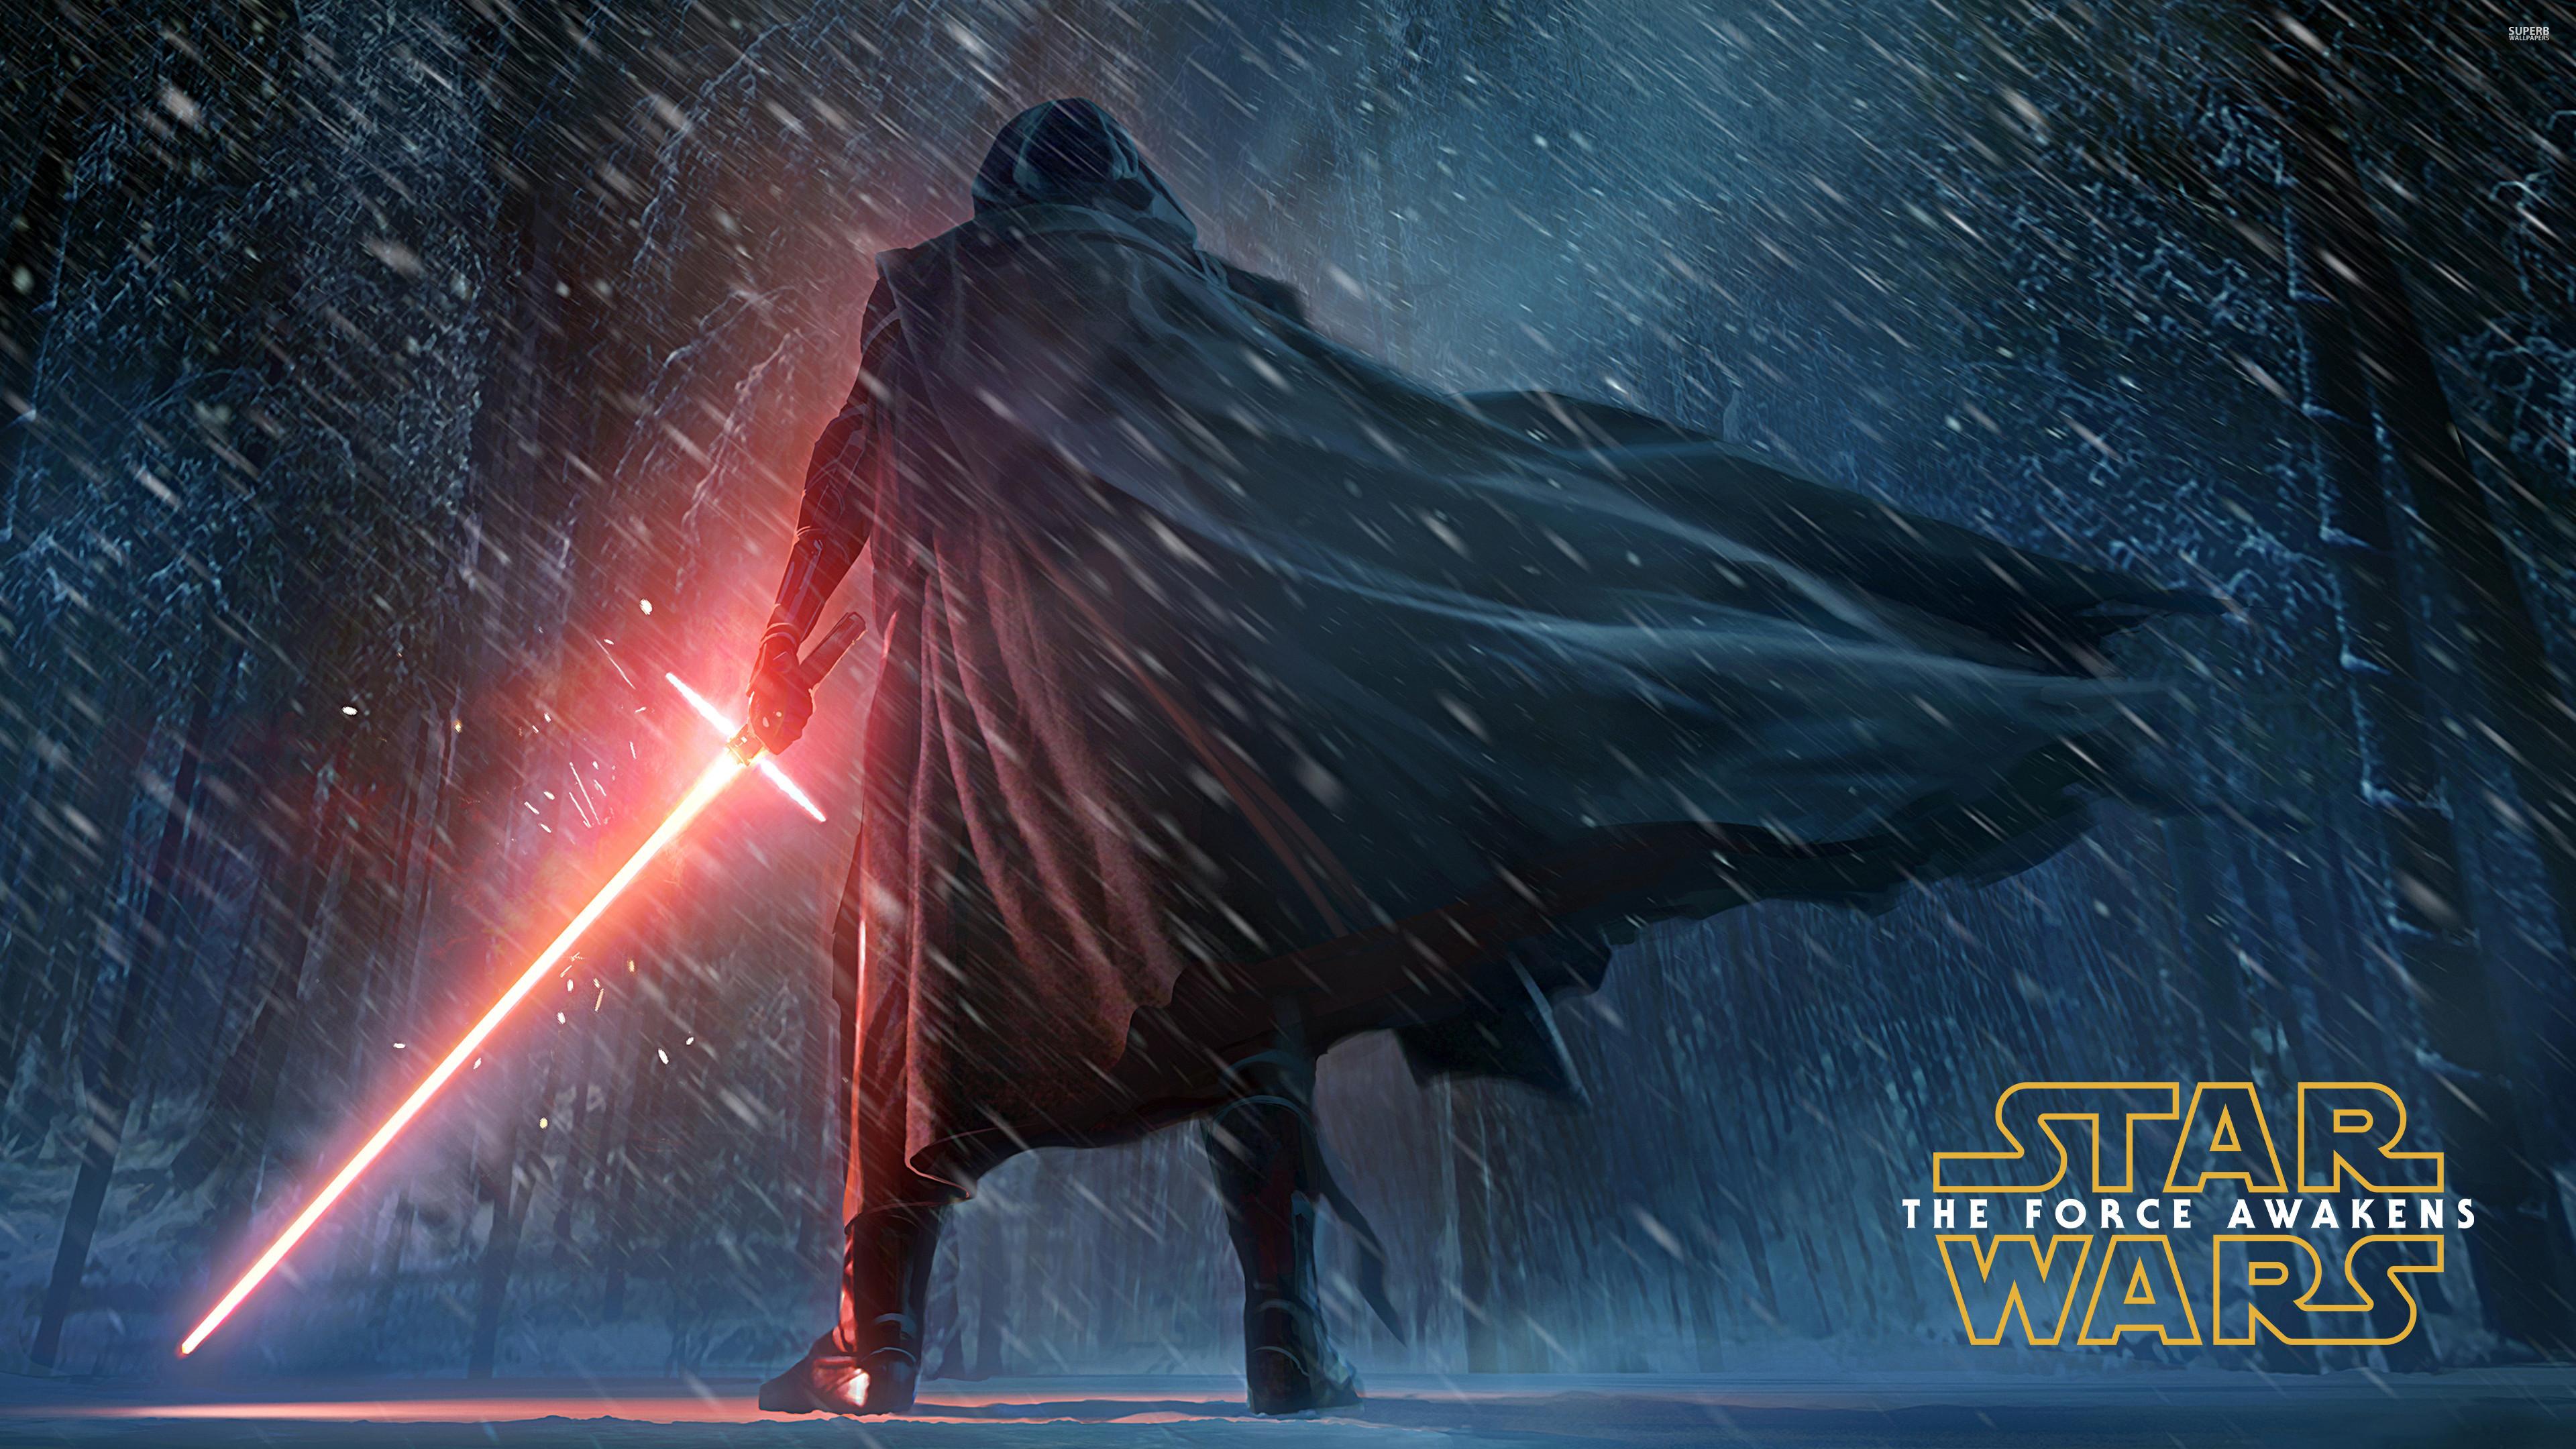 Kylo Ren Star Wars wallpaper HD background download desktop .